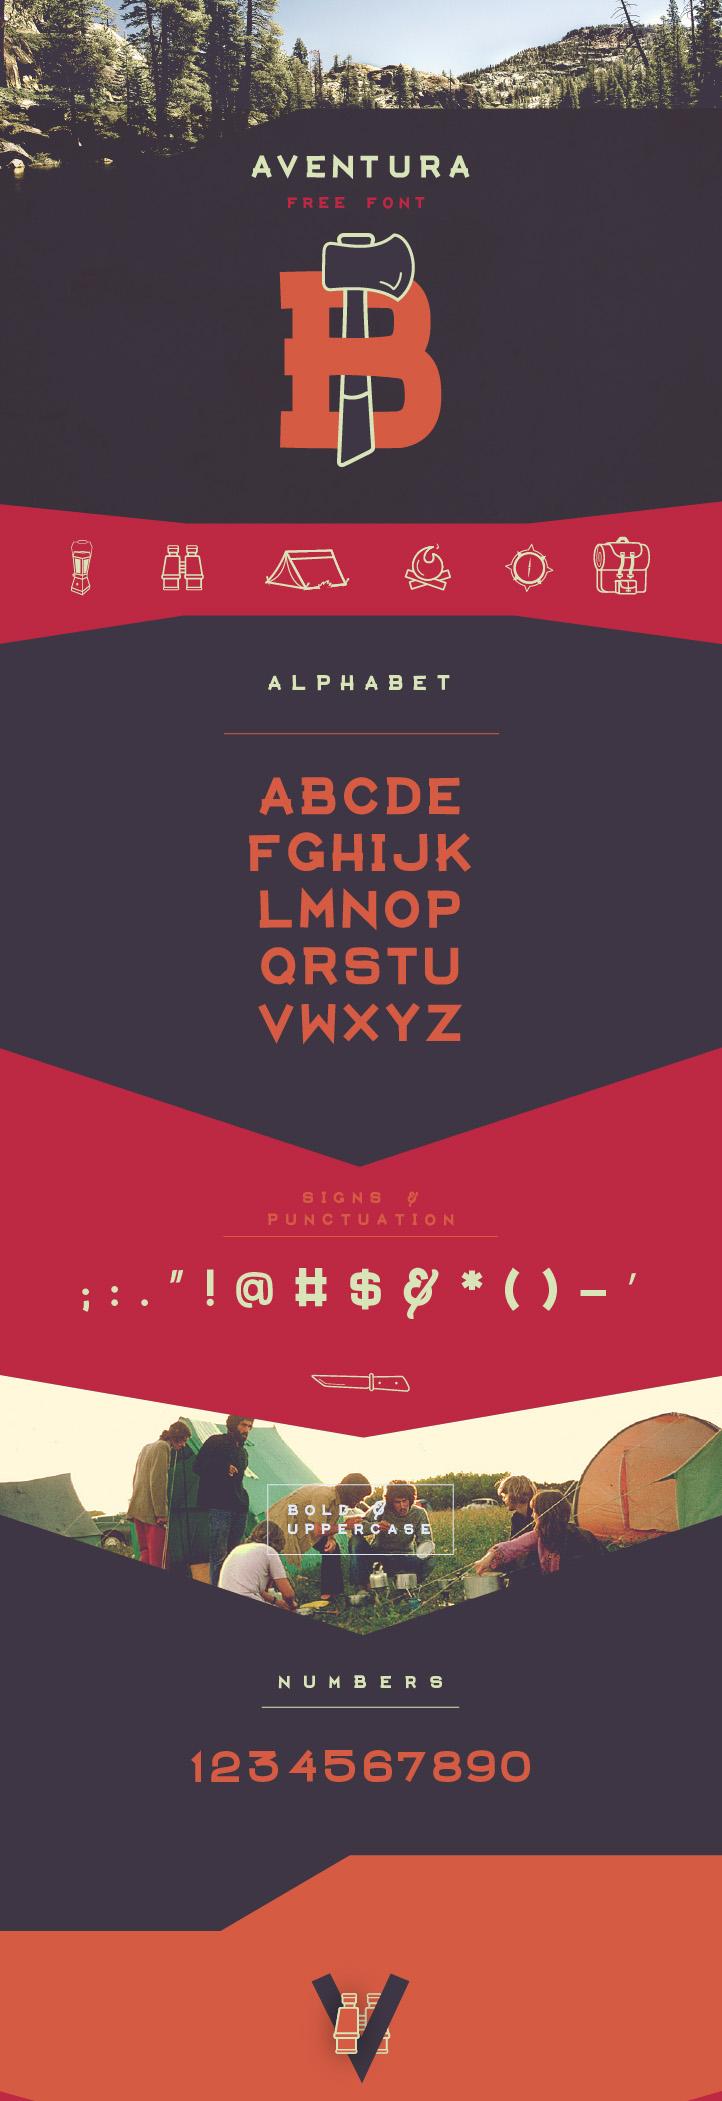 AVENTURA - Free Typeface on Behance